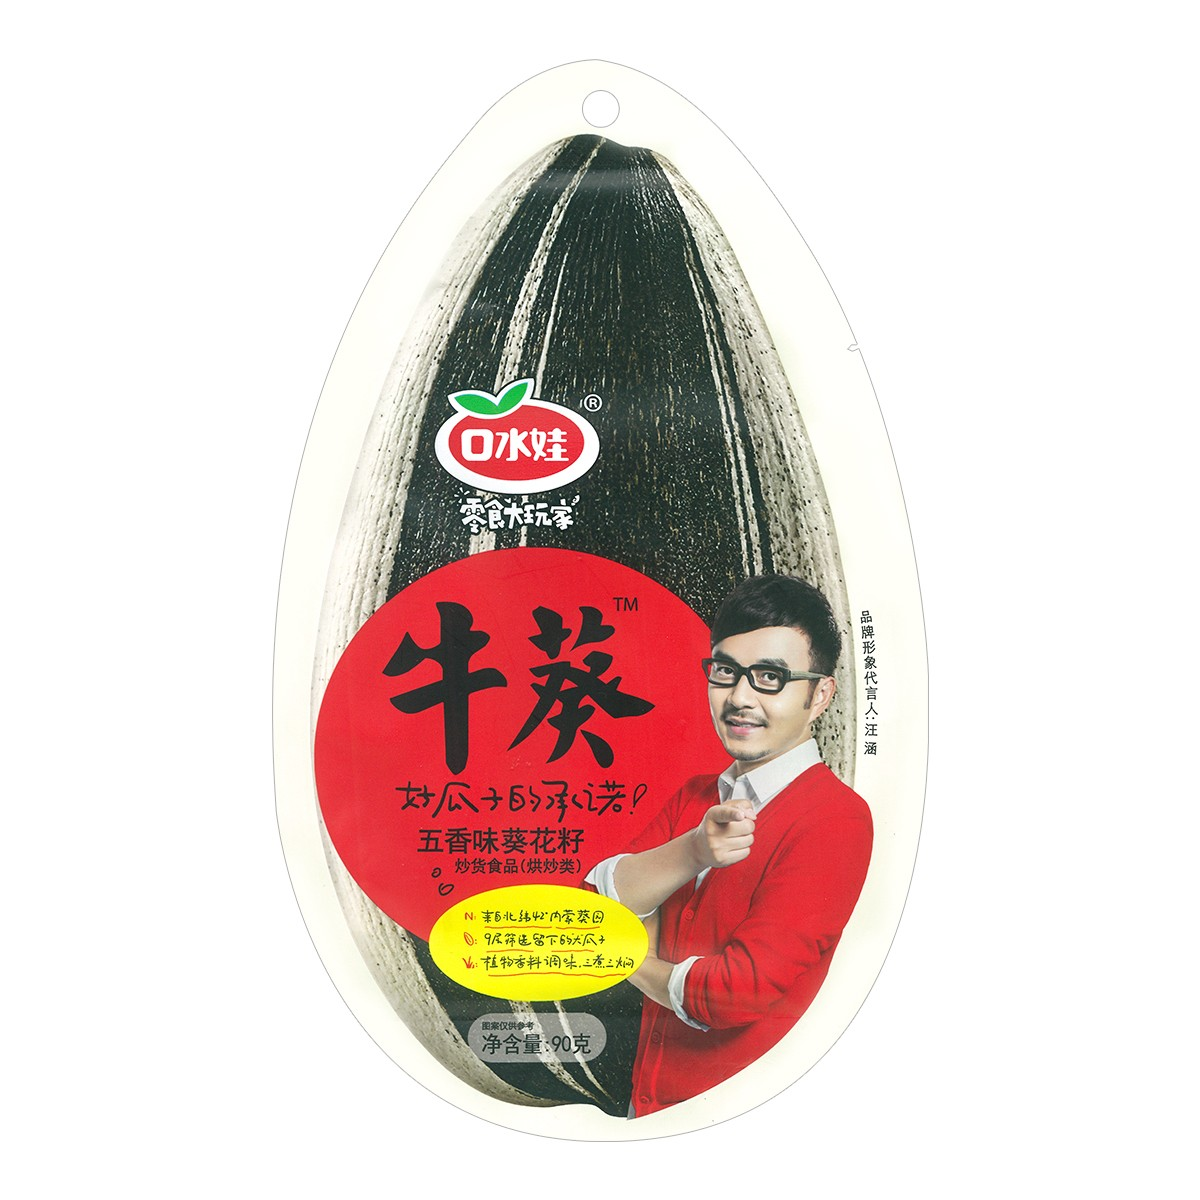 KOUSHUIWA Sunflower Seeds - Five Spicy Flavor 90g